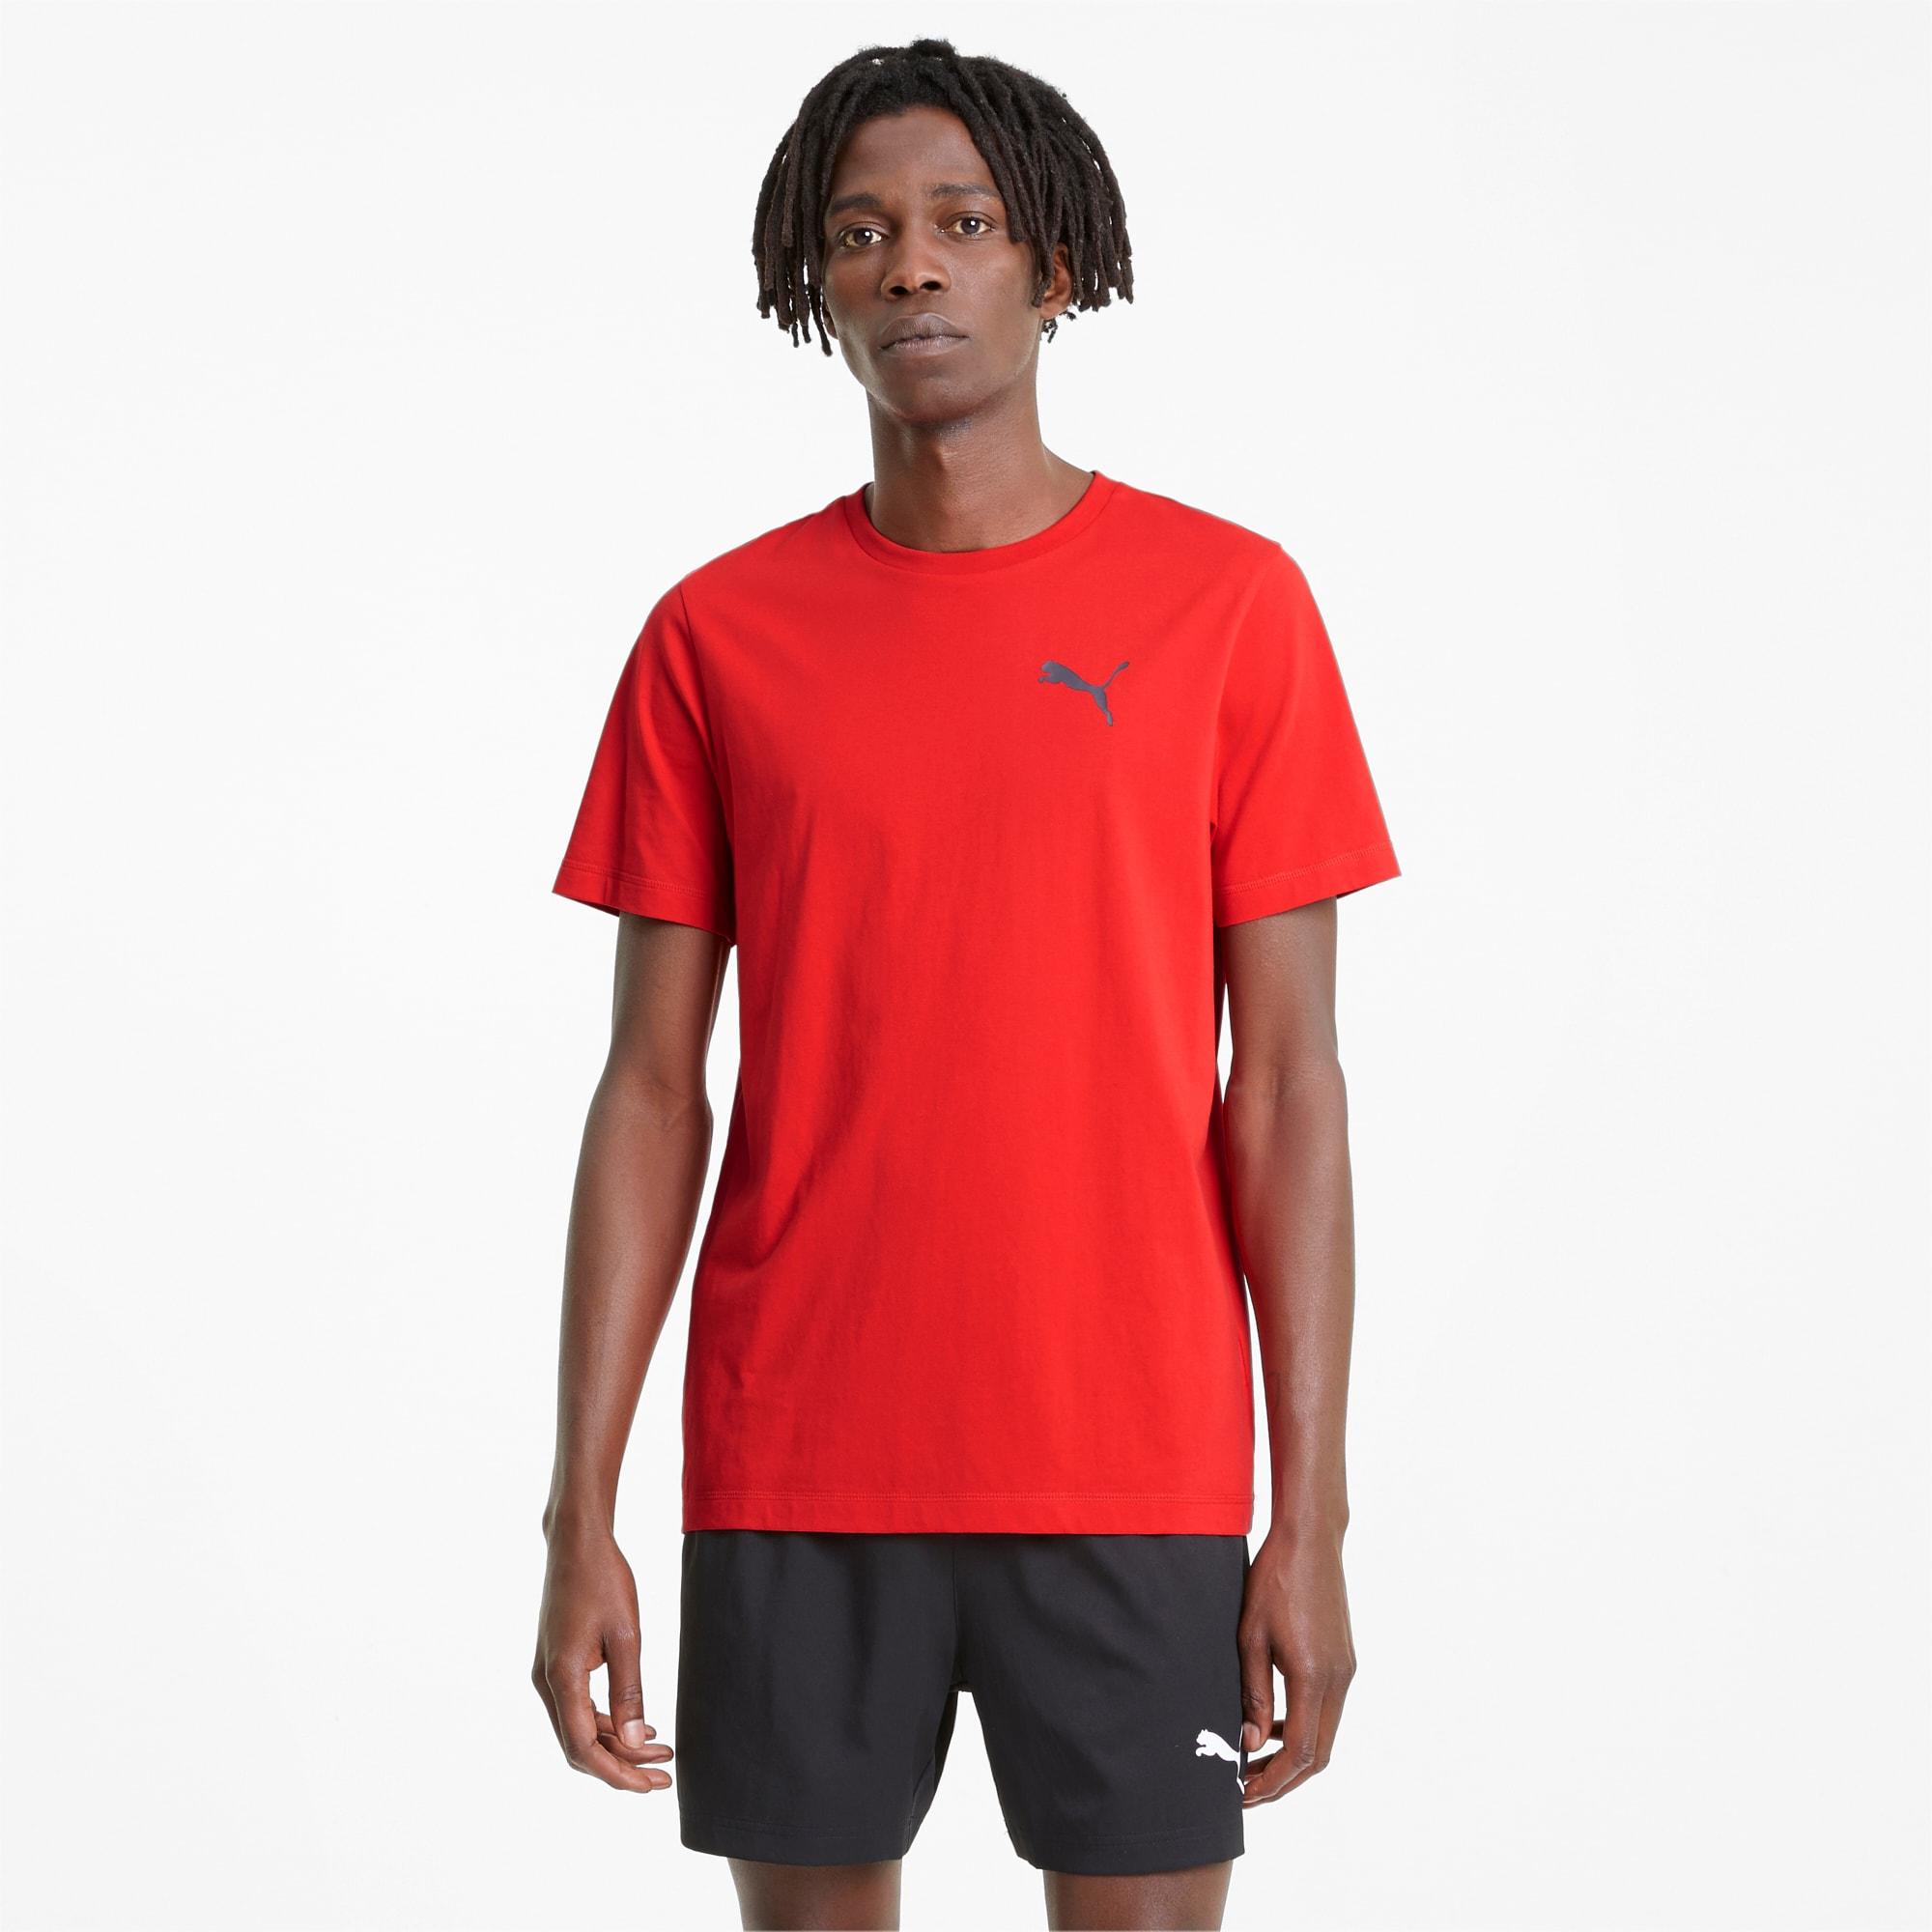 Zacht Active T-shirt heren, Rood, Maat XS   PUMA